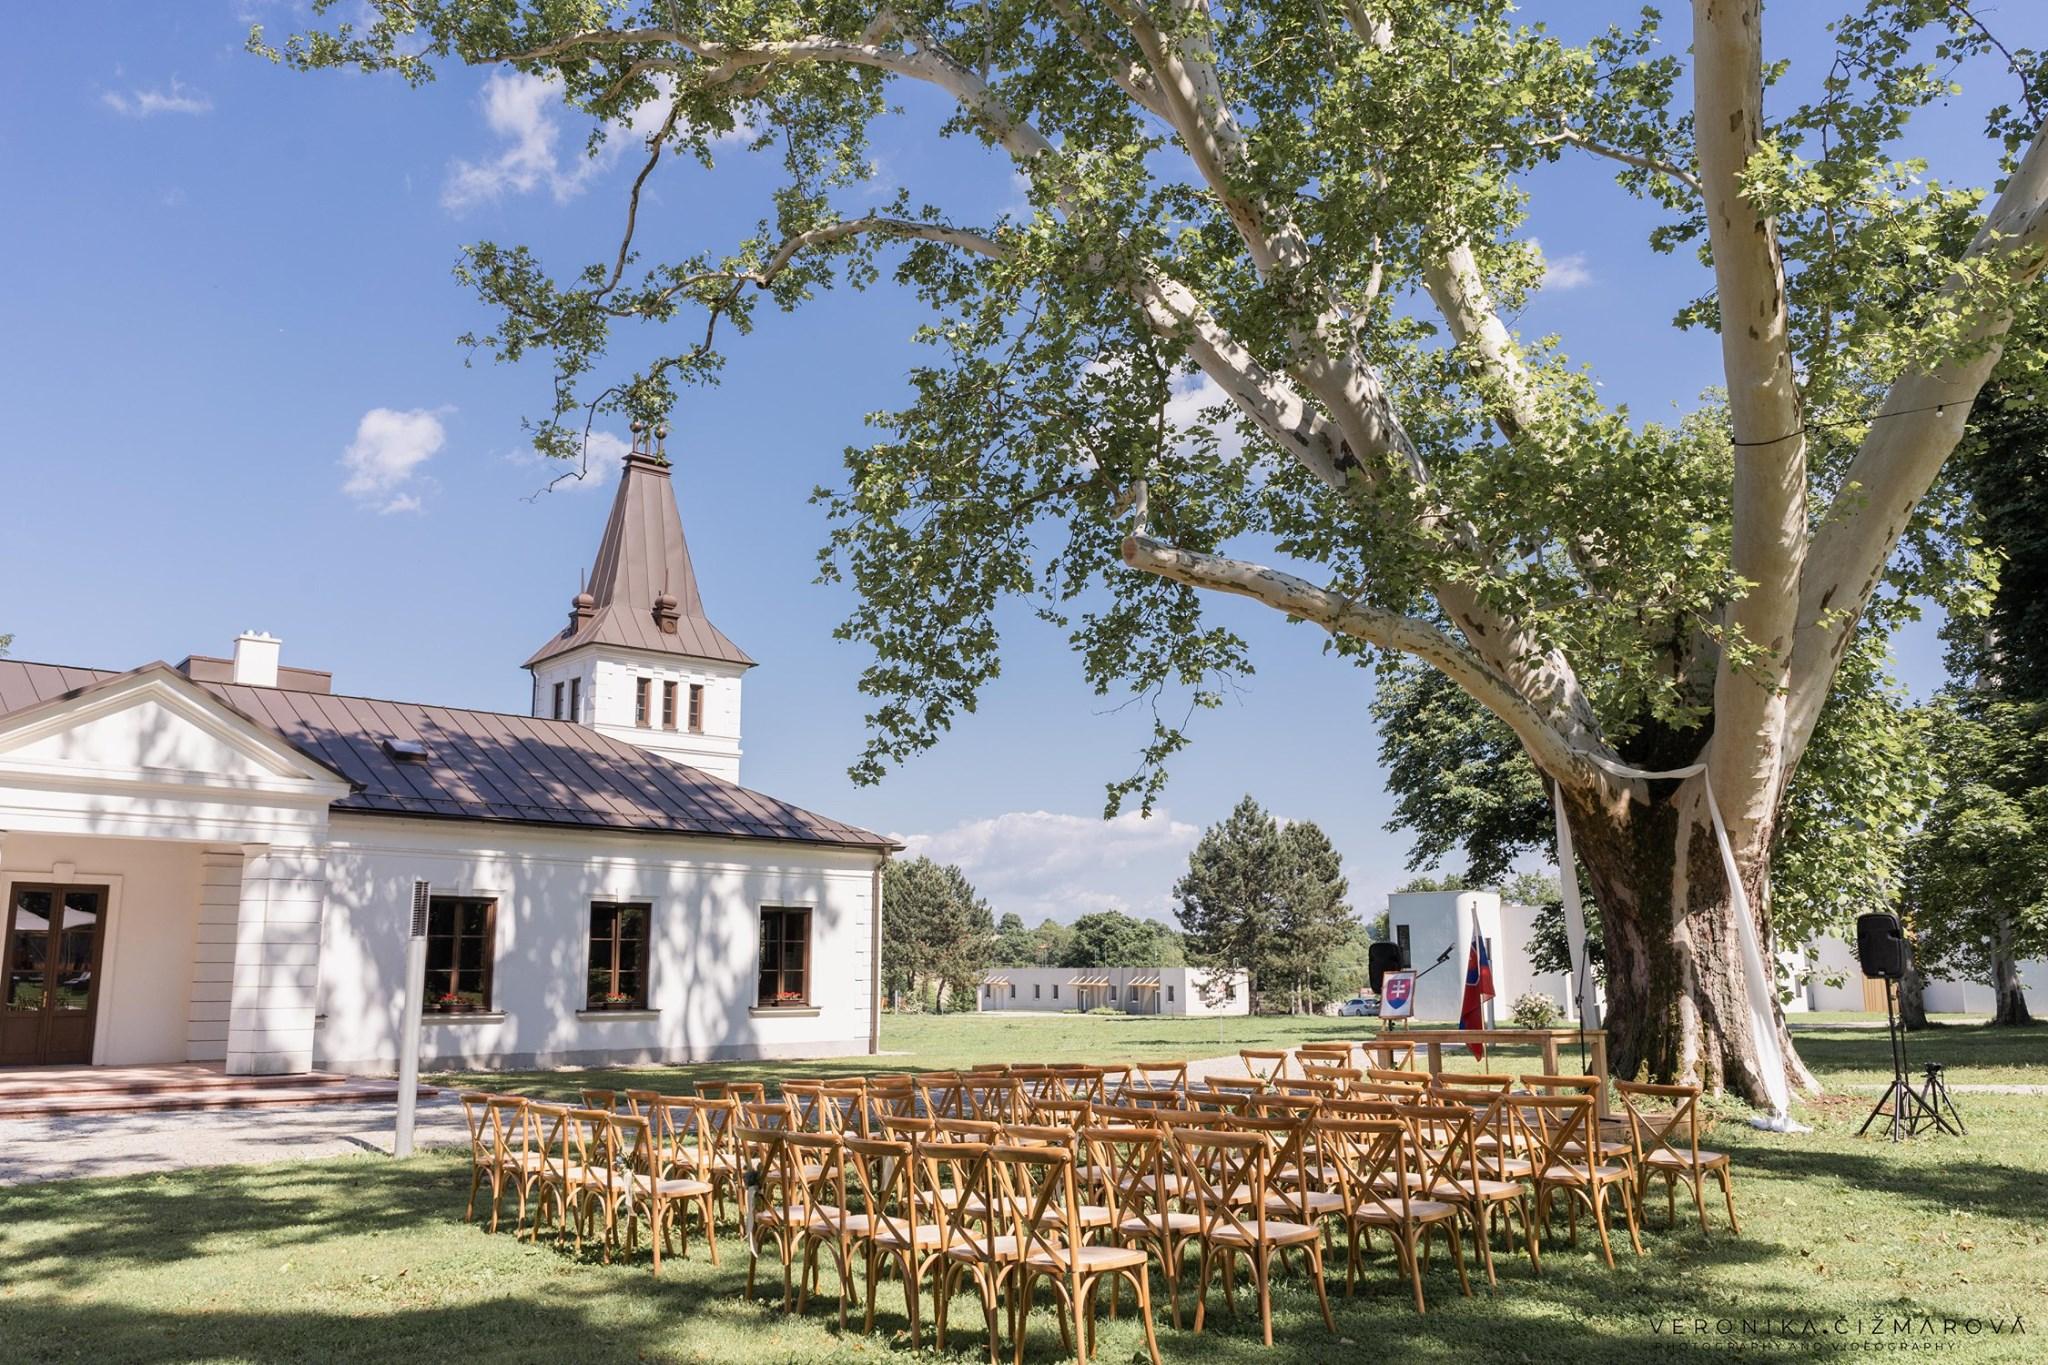 svadba-v-prirode-boho-svadbajpg